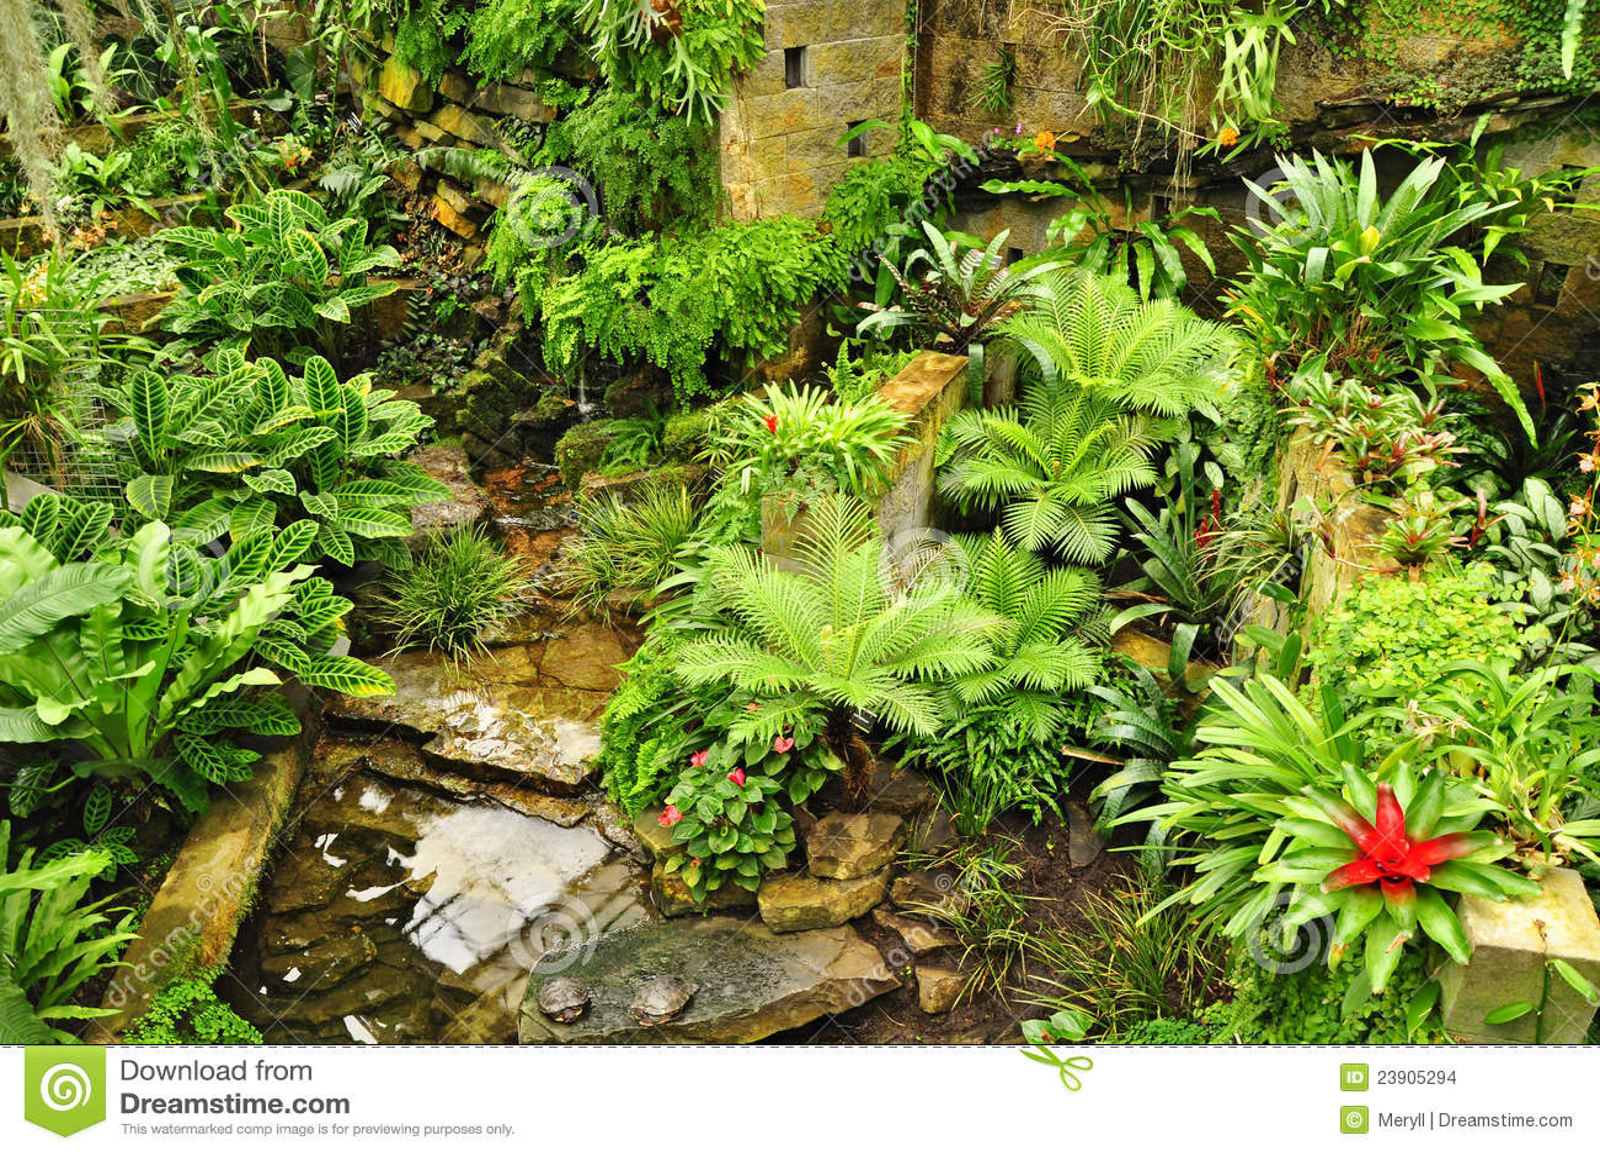 Maldives Villa Floor Plan together with Stock Images Tropical Garden Green Plants Image23905294 moreover Spanish Villa Floor Plans together with Oakland Votes 2012 Liveblogging The Election besides Rustic Cabin Floor Plans. on spanish house plans